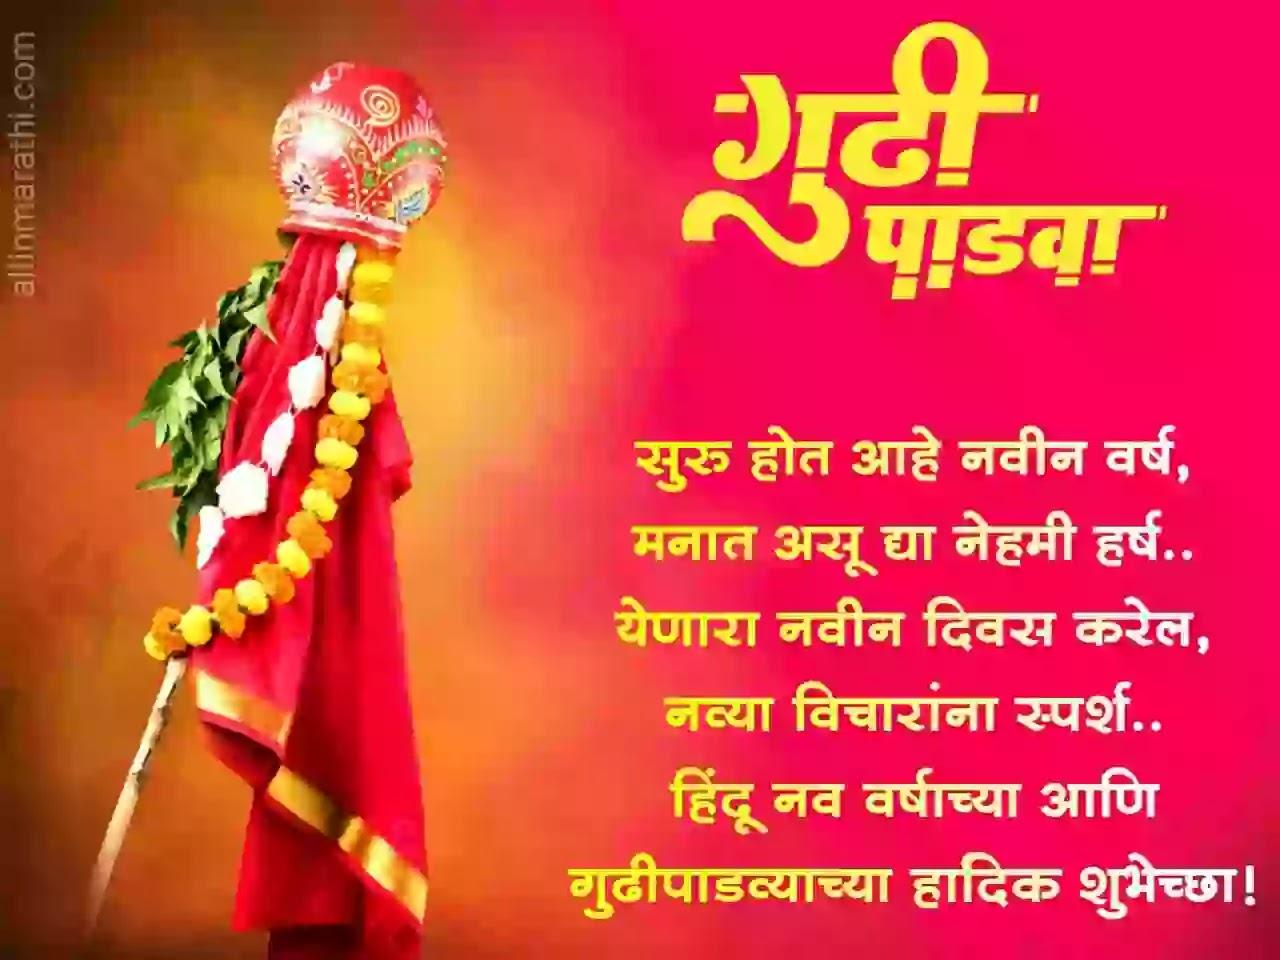 Gudi-messages-marathi